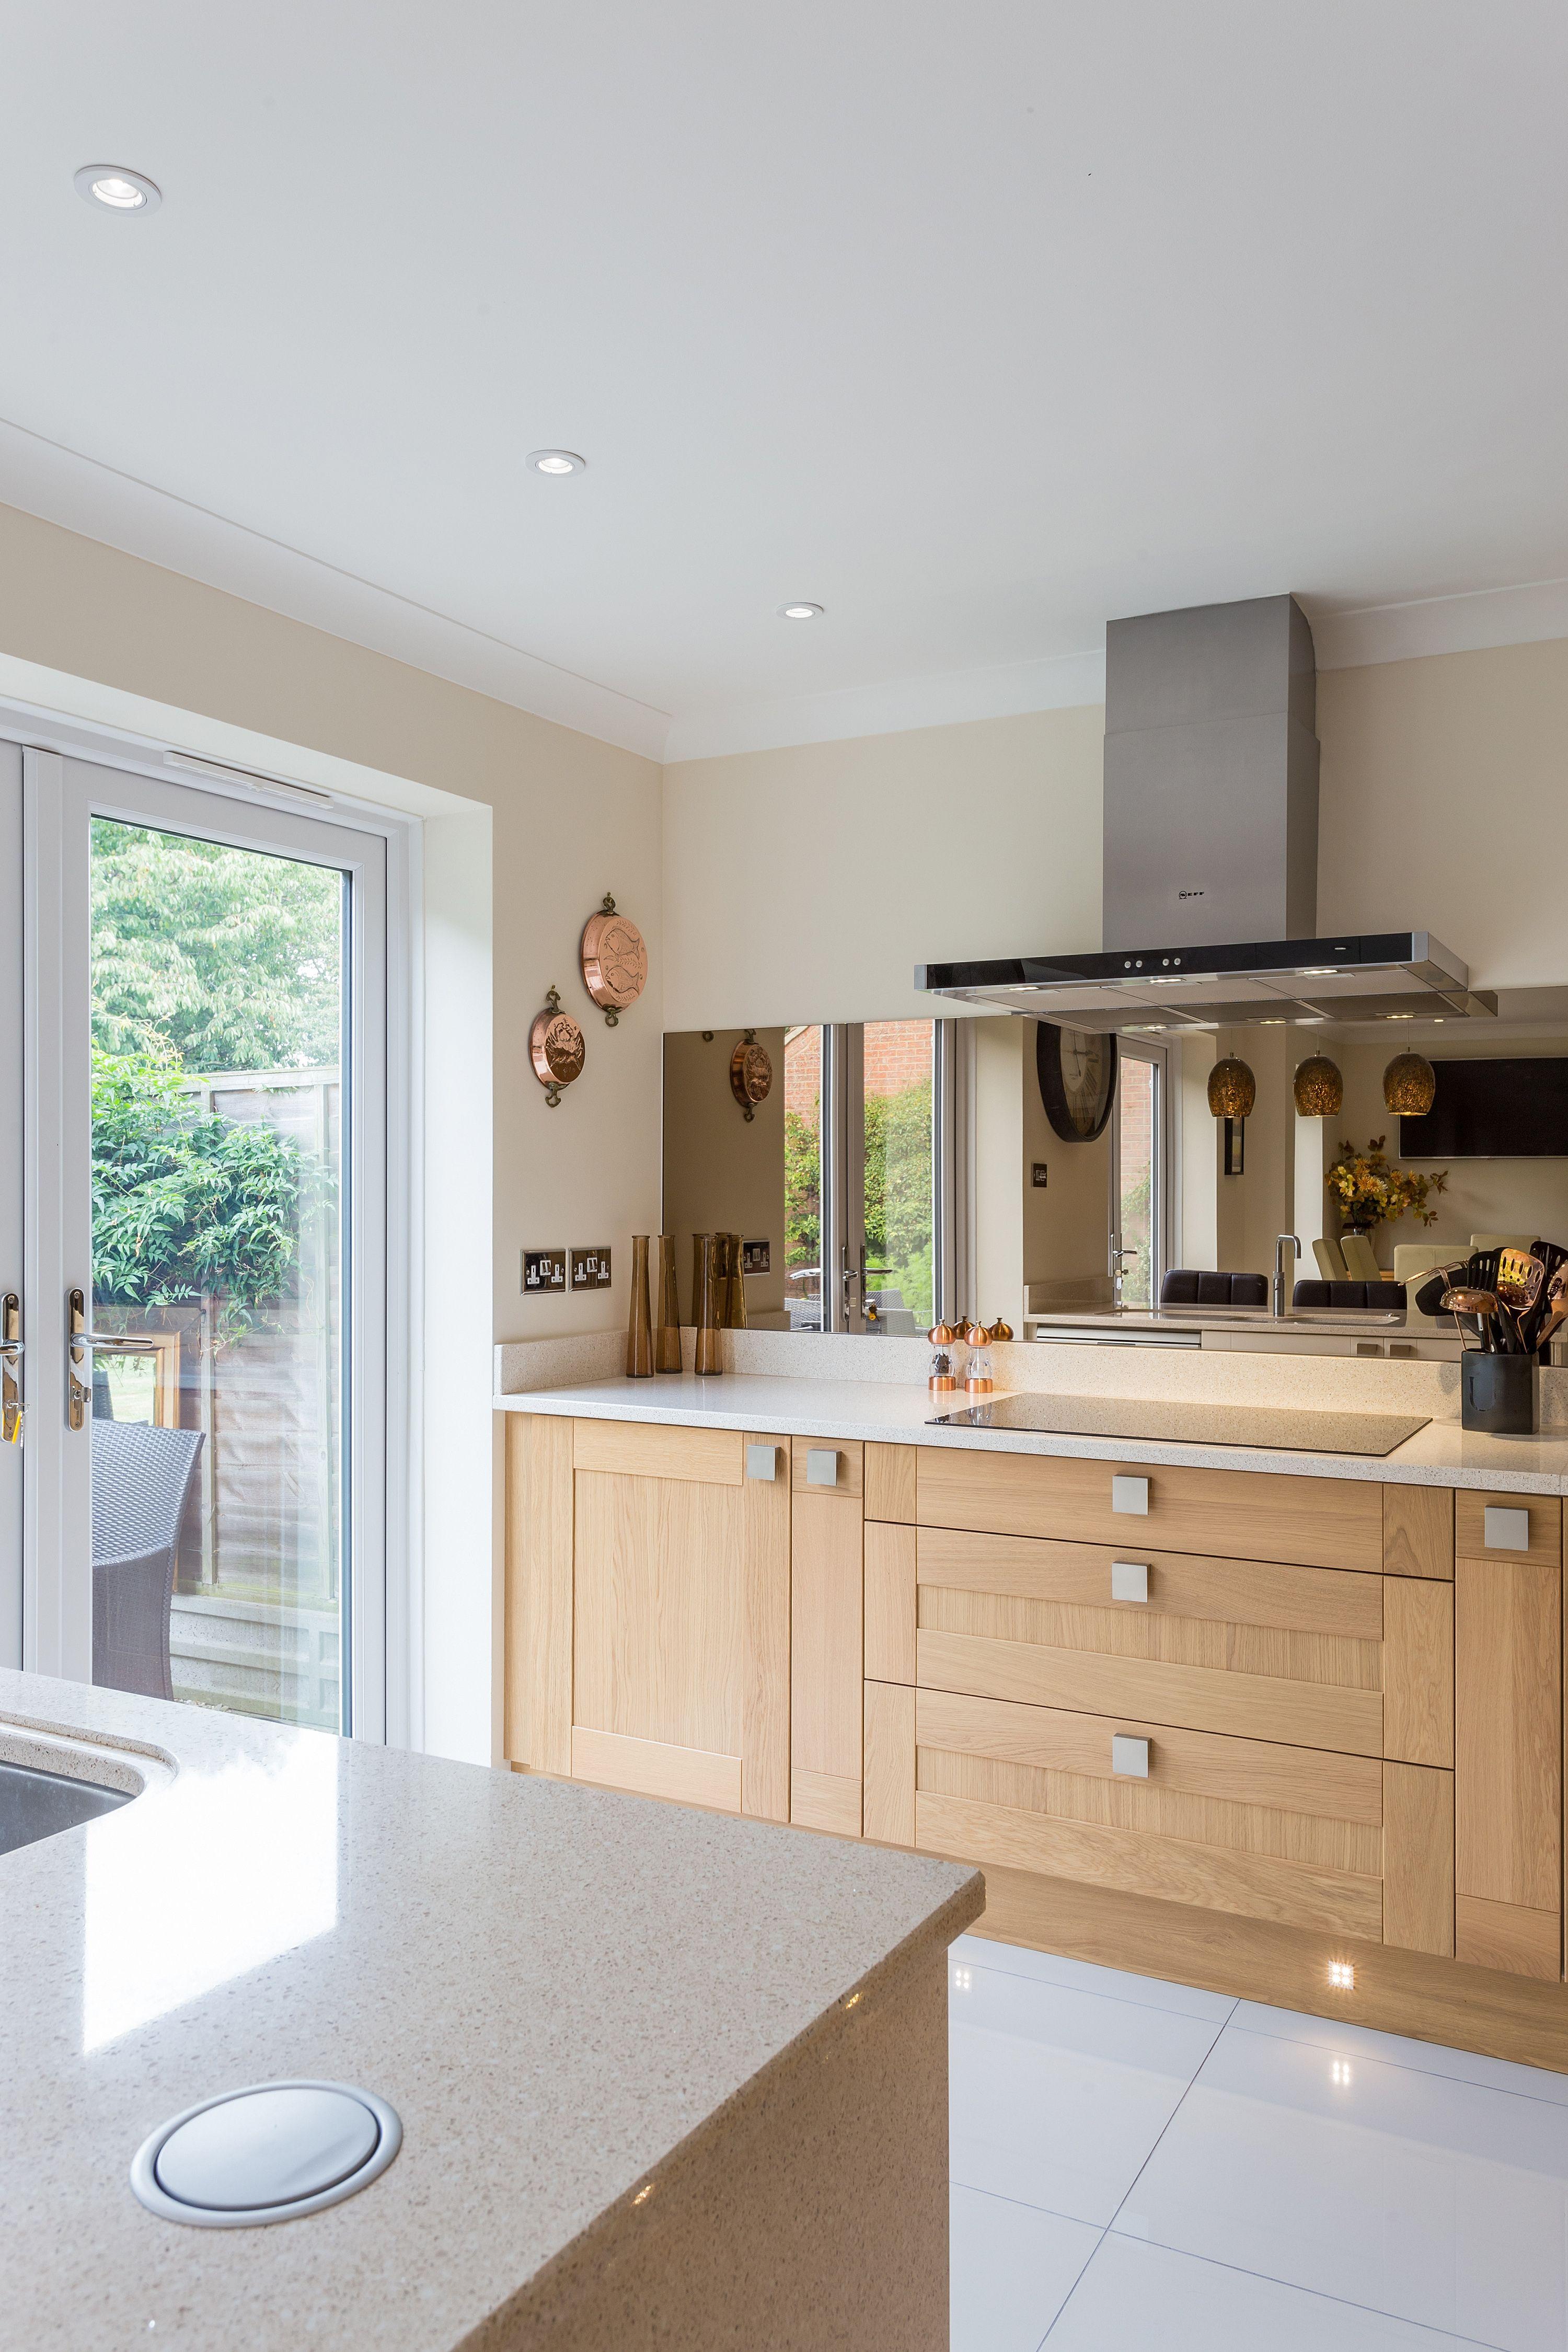 Beautiful Oak And Almond Shaker Kitchen With Smokey Glass Splash Backs Accentuating This Sophisticated Modern Oak Kitchen Bespoke Kitchen Design Kitchen Design